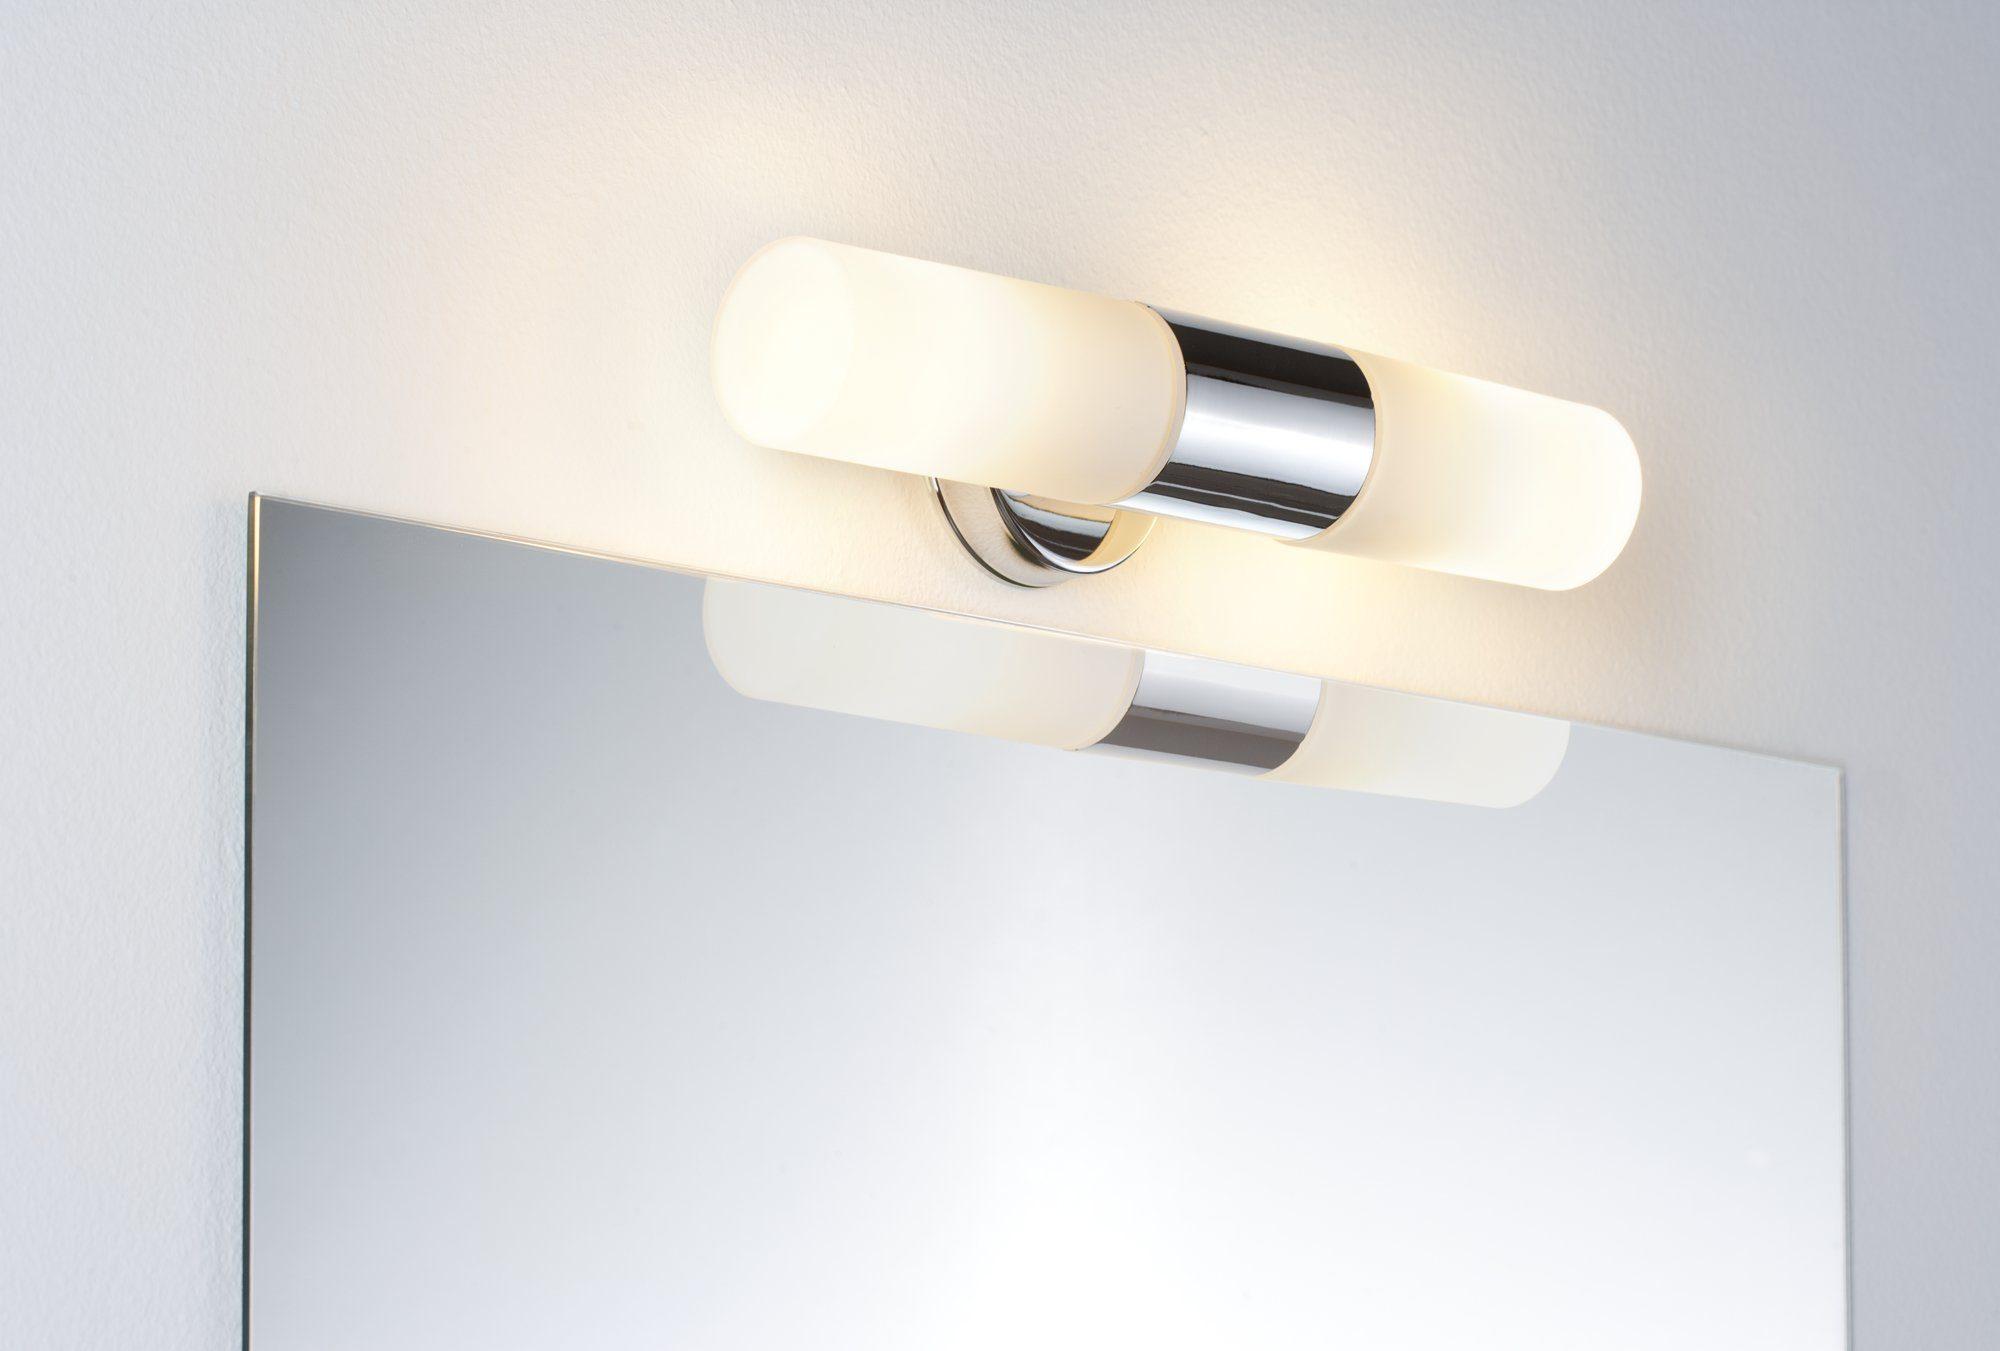 Paulmann,LED Wandleuchte Spiegelleuchte Lenia max. 2x20W Chrom Opak Metall Glas E14